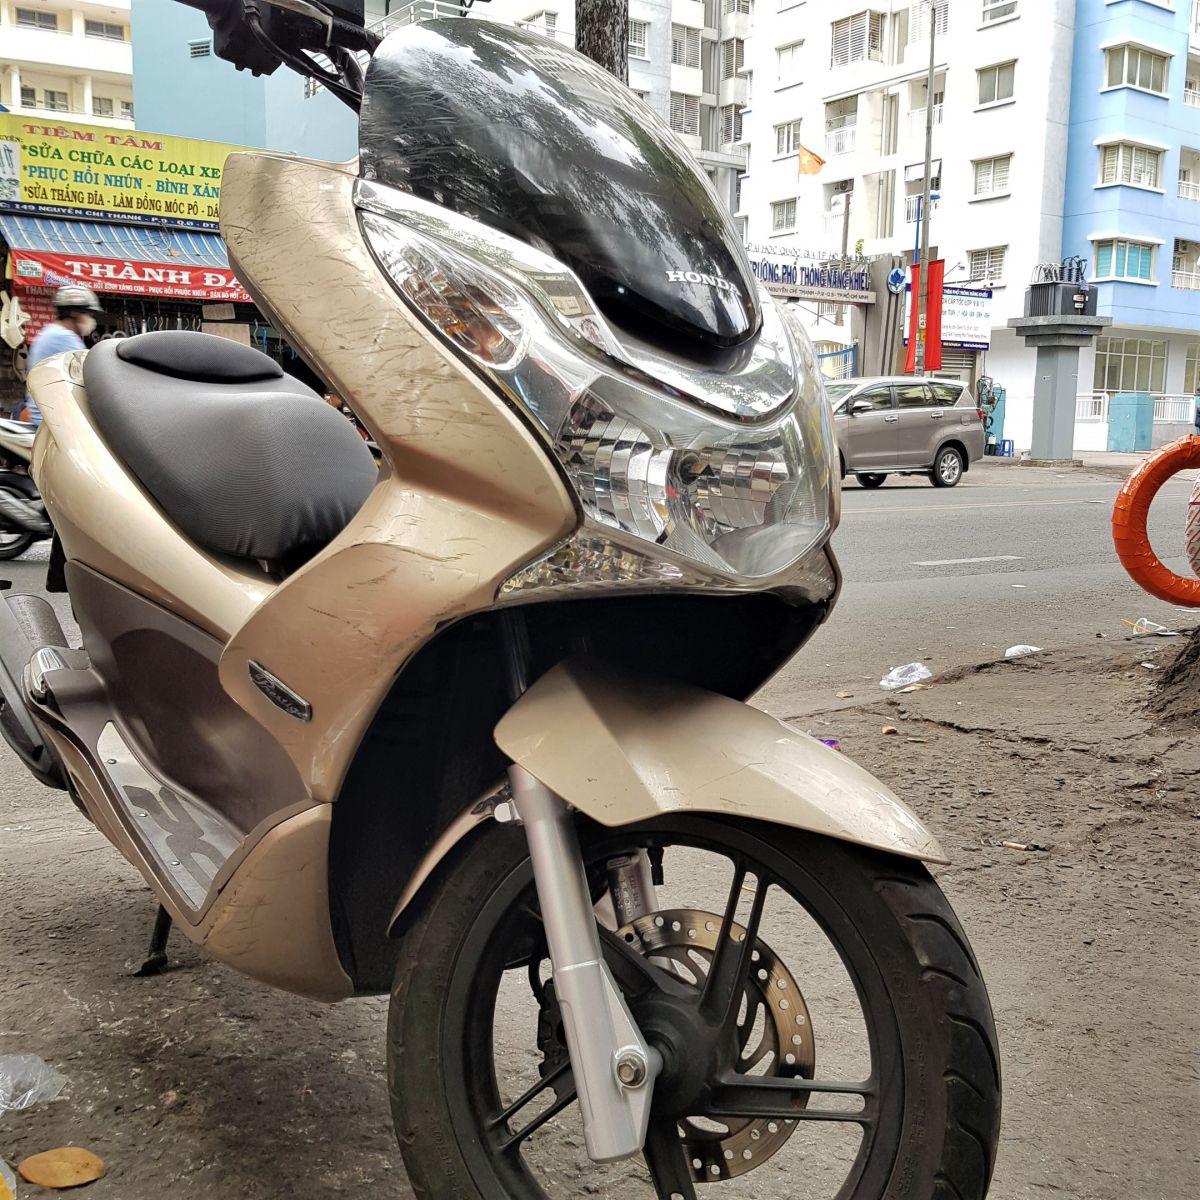 Phuoc-nhun-giam-xoc-truoc-PCX-Thai-Lan-chinh-hang-Honda-13